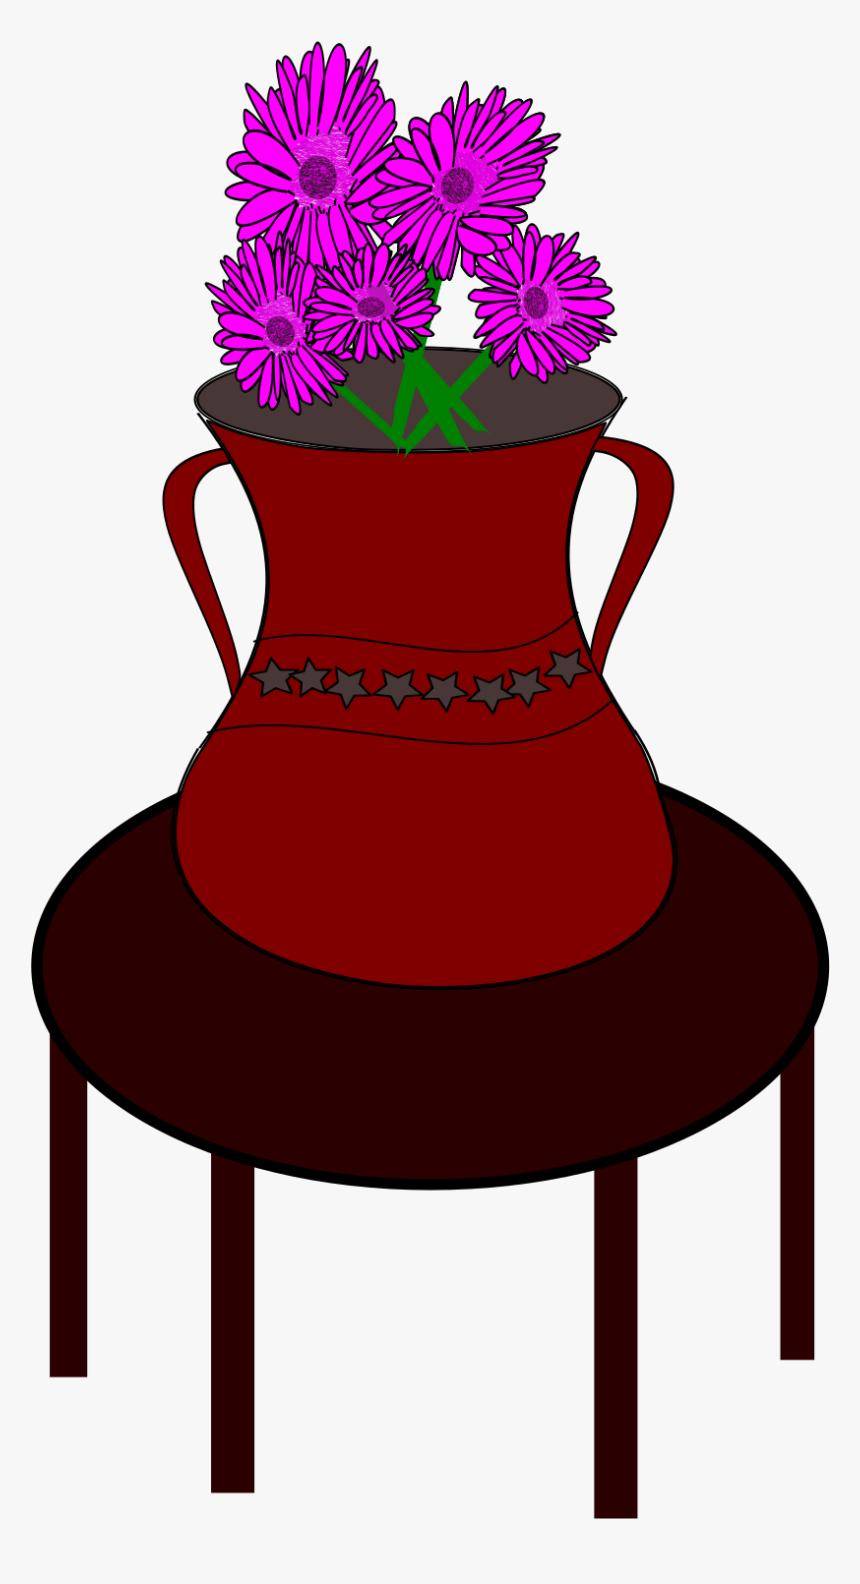 Flower Vase Clip Arts - Flower Vase On The Table, HD Png Download, Free Download